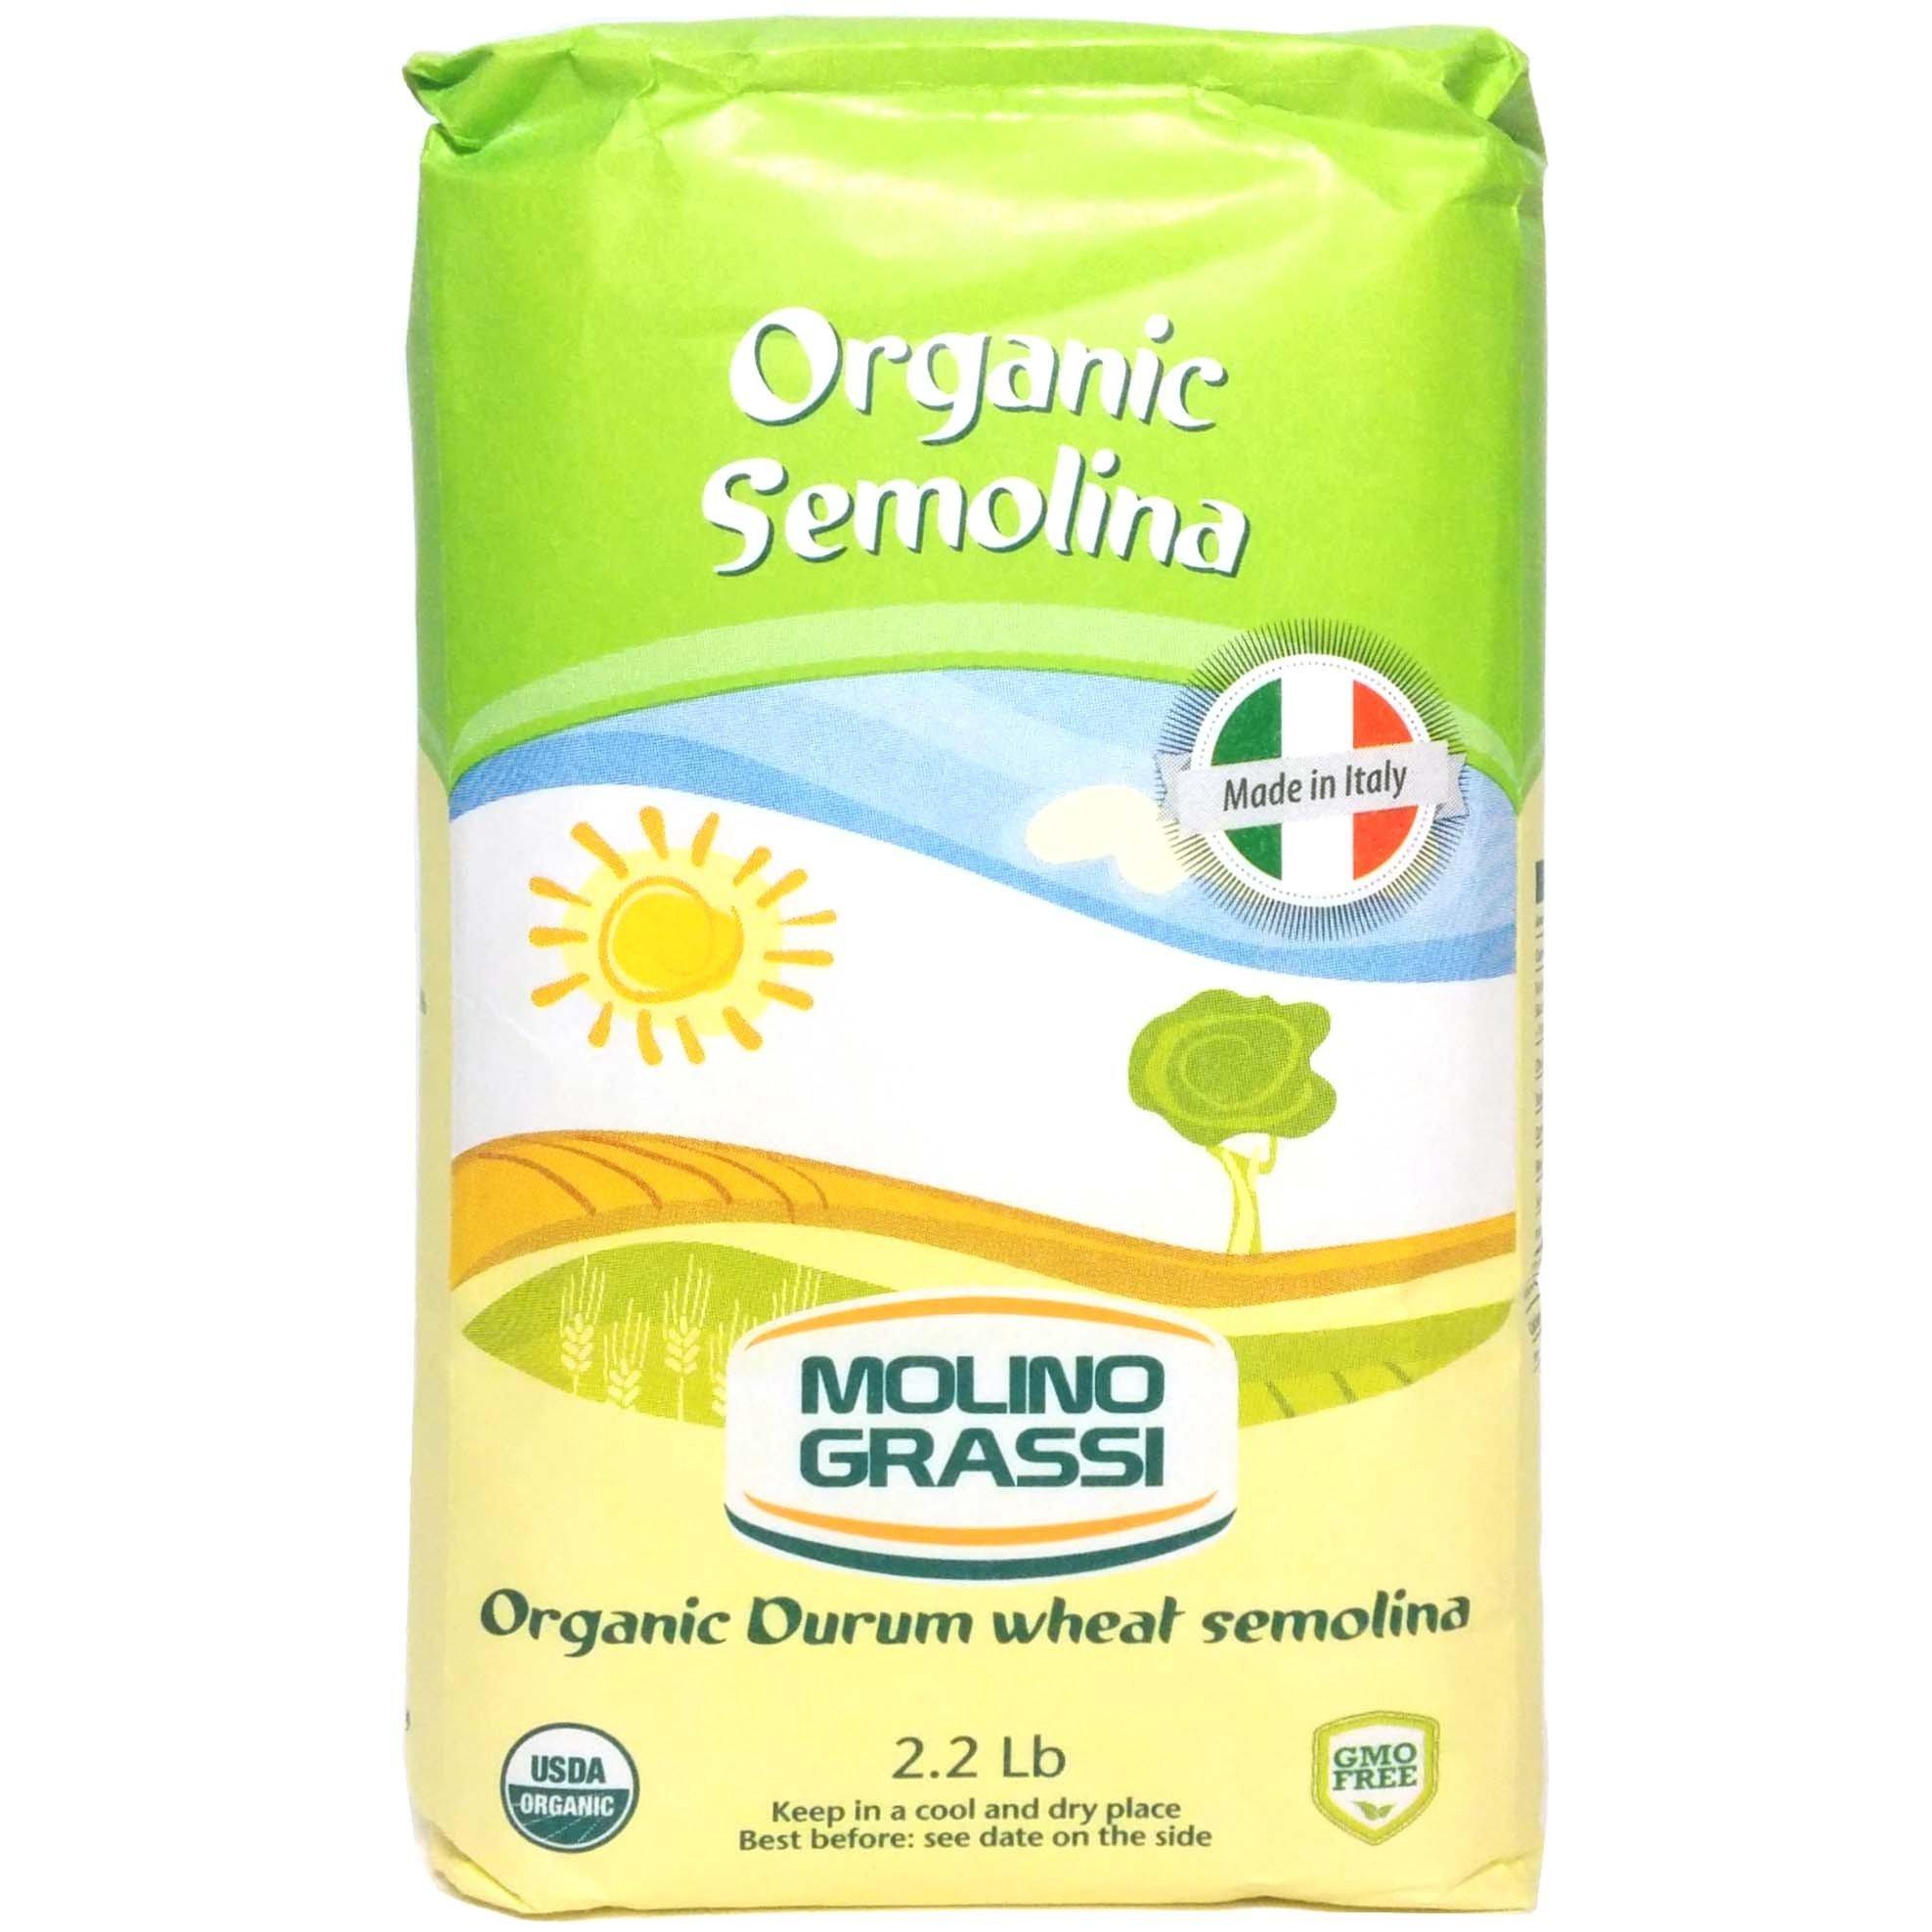 Molino Grassi USDA Organic Durum Wheat Semolina Flour, 2.2 Pound (Pack of 10) by Molino Grassi (Image #1)